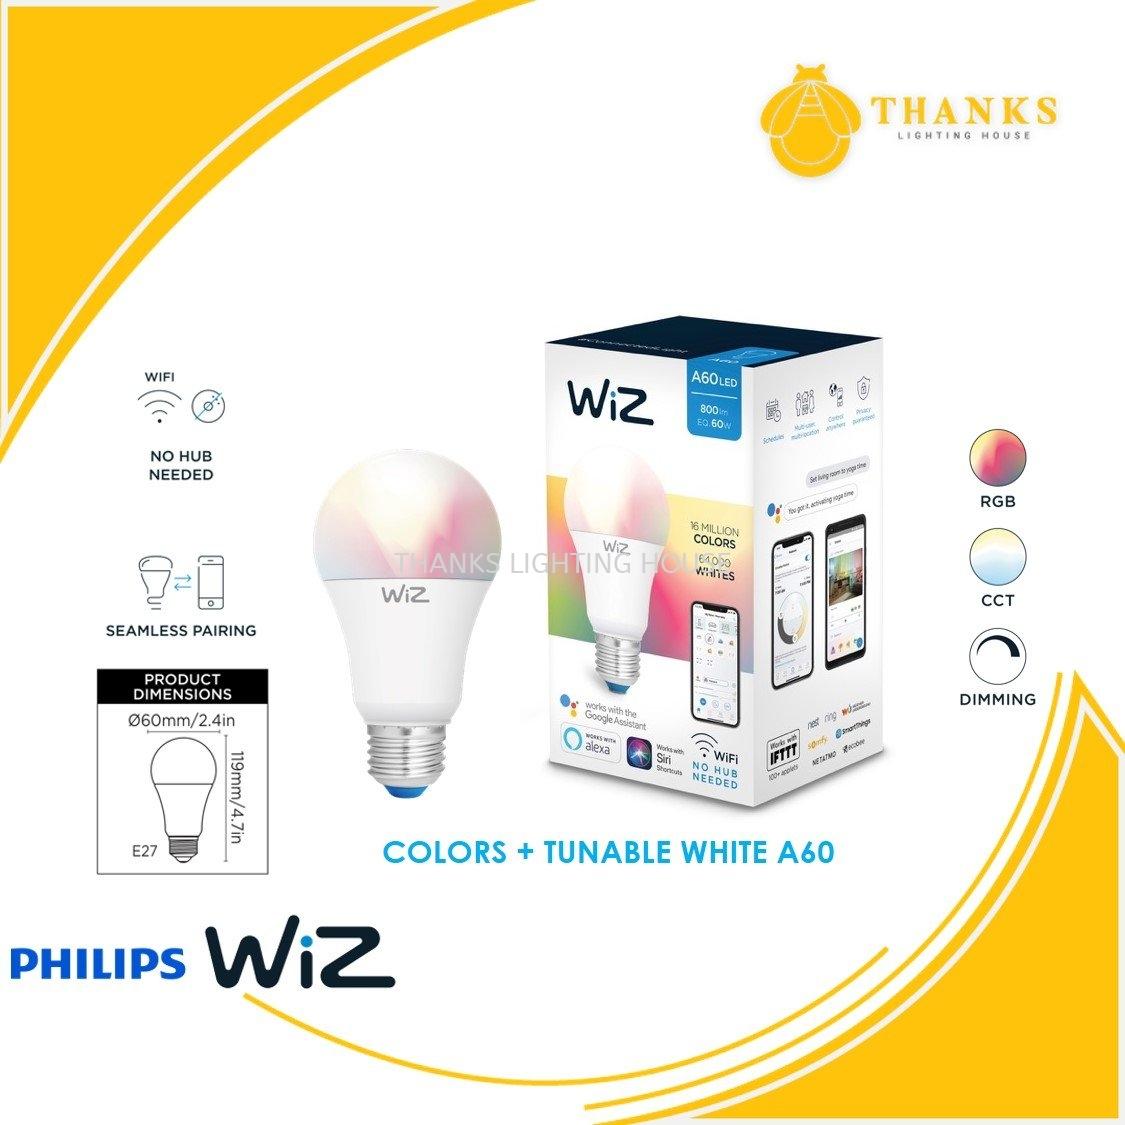 Philips Wiz Colour + Tunable White A60 LED Smart Bulb